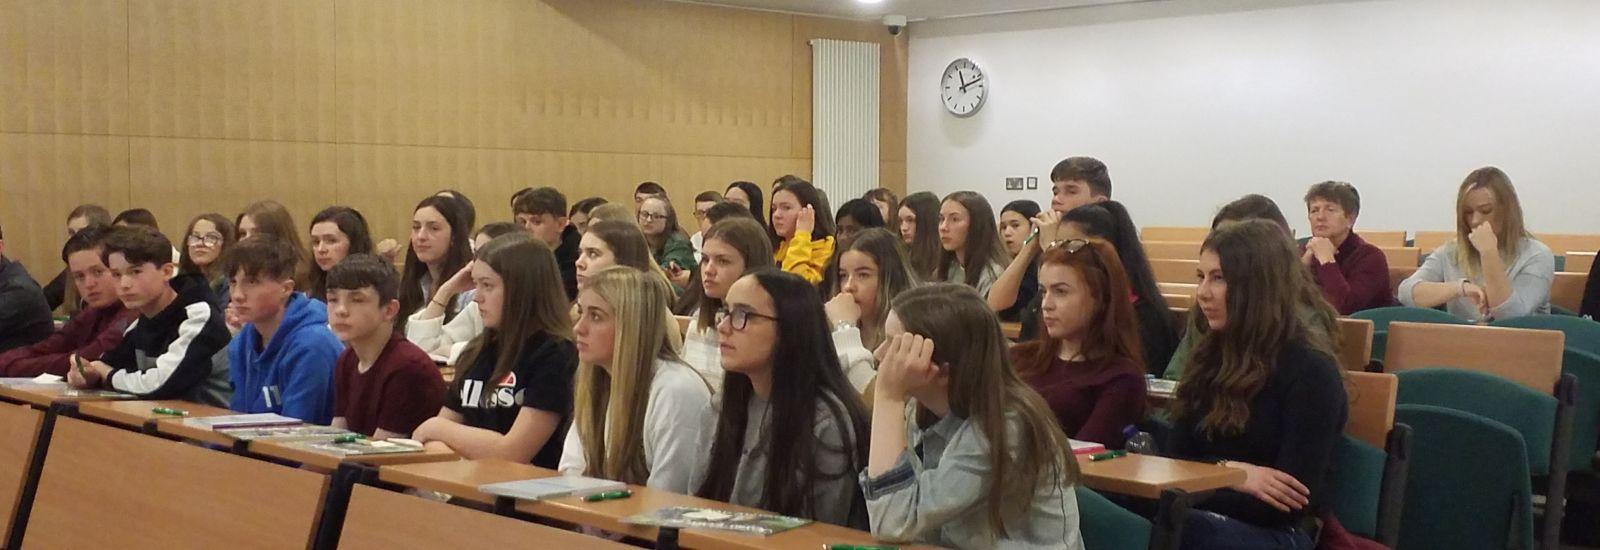 A Seren Hub lecture Oxford